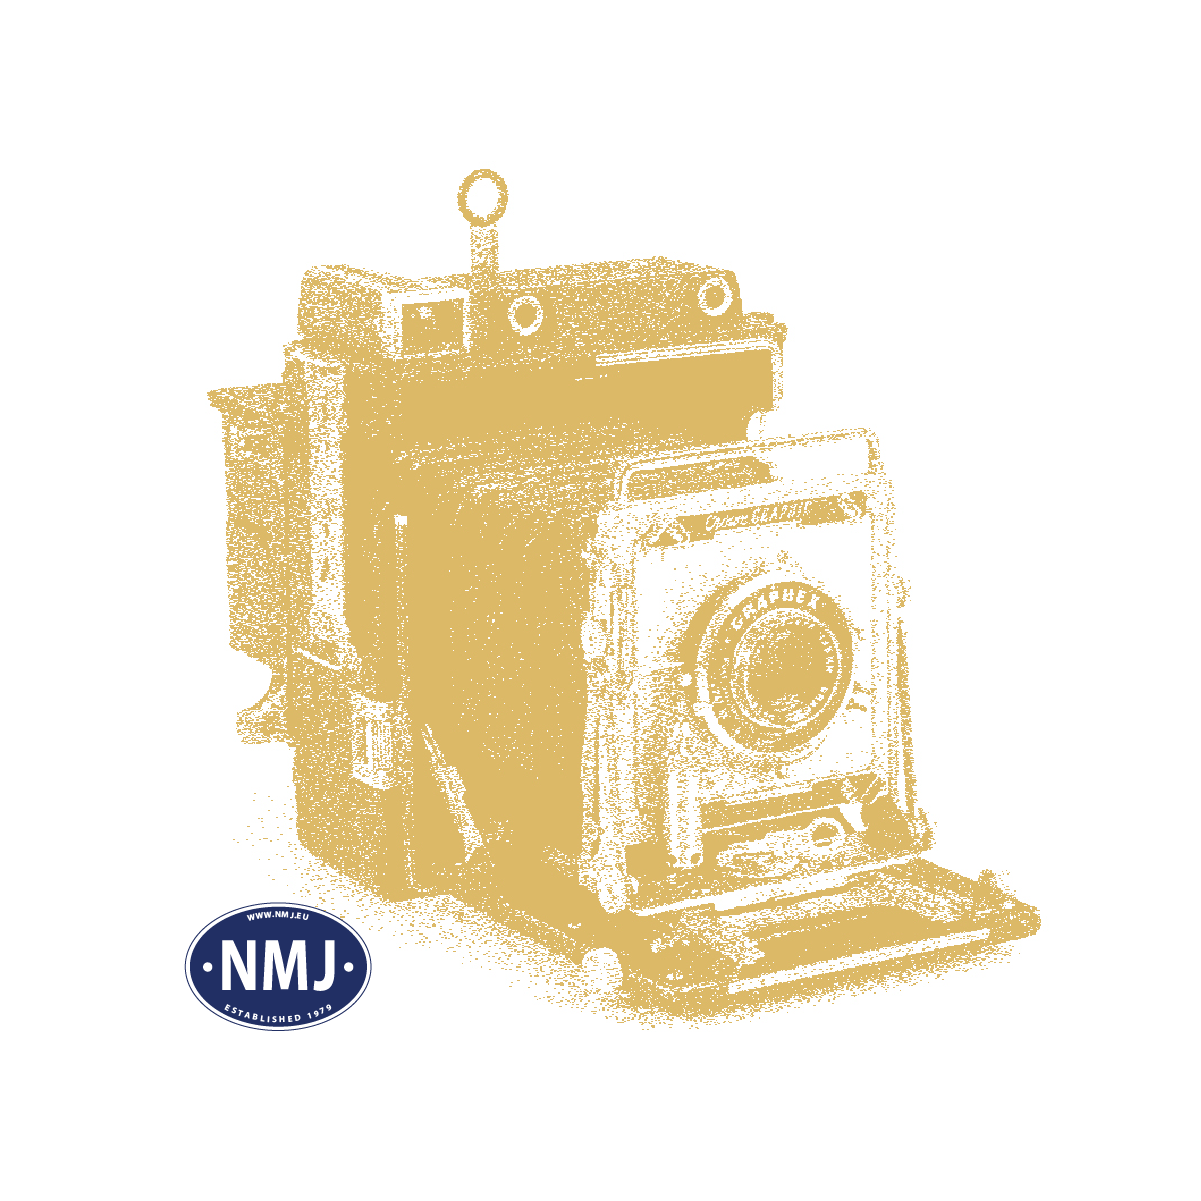 NMJT245001 - NMJ Topline NSB Di3b 641 Rotbraun, 0-Skala, DCC m/Sound